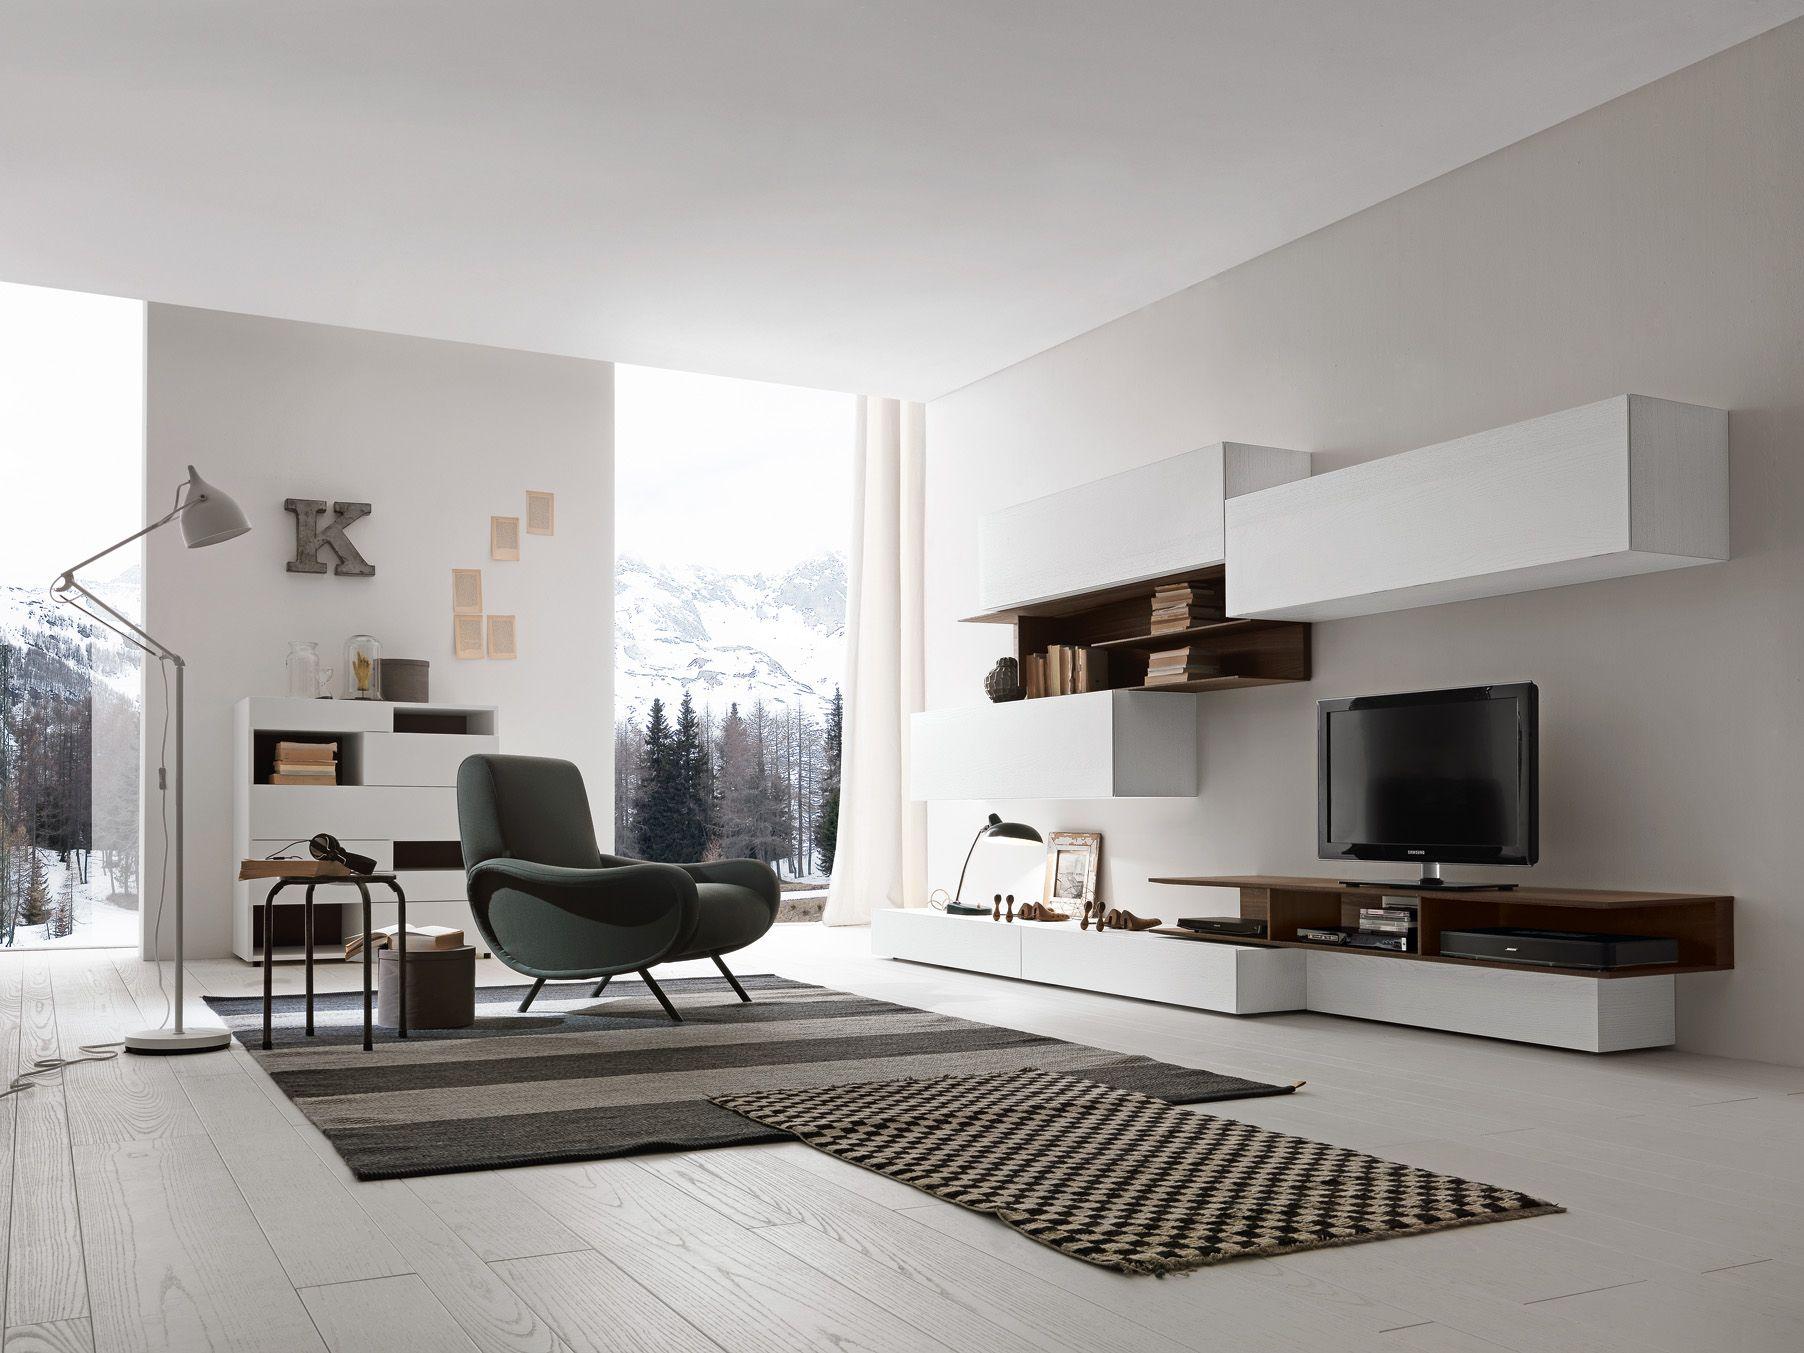 Presotto base and wall units in bianco candido color for Presotto mobili